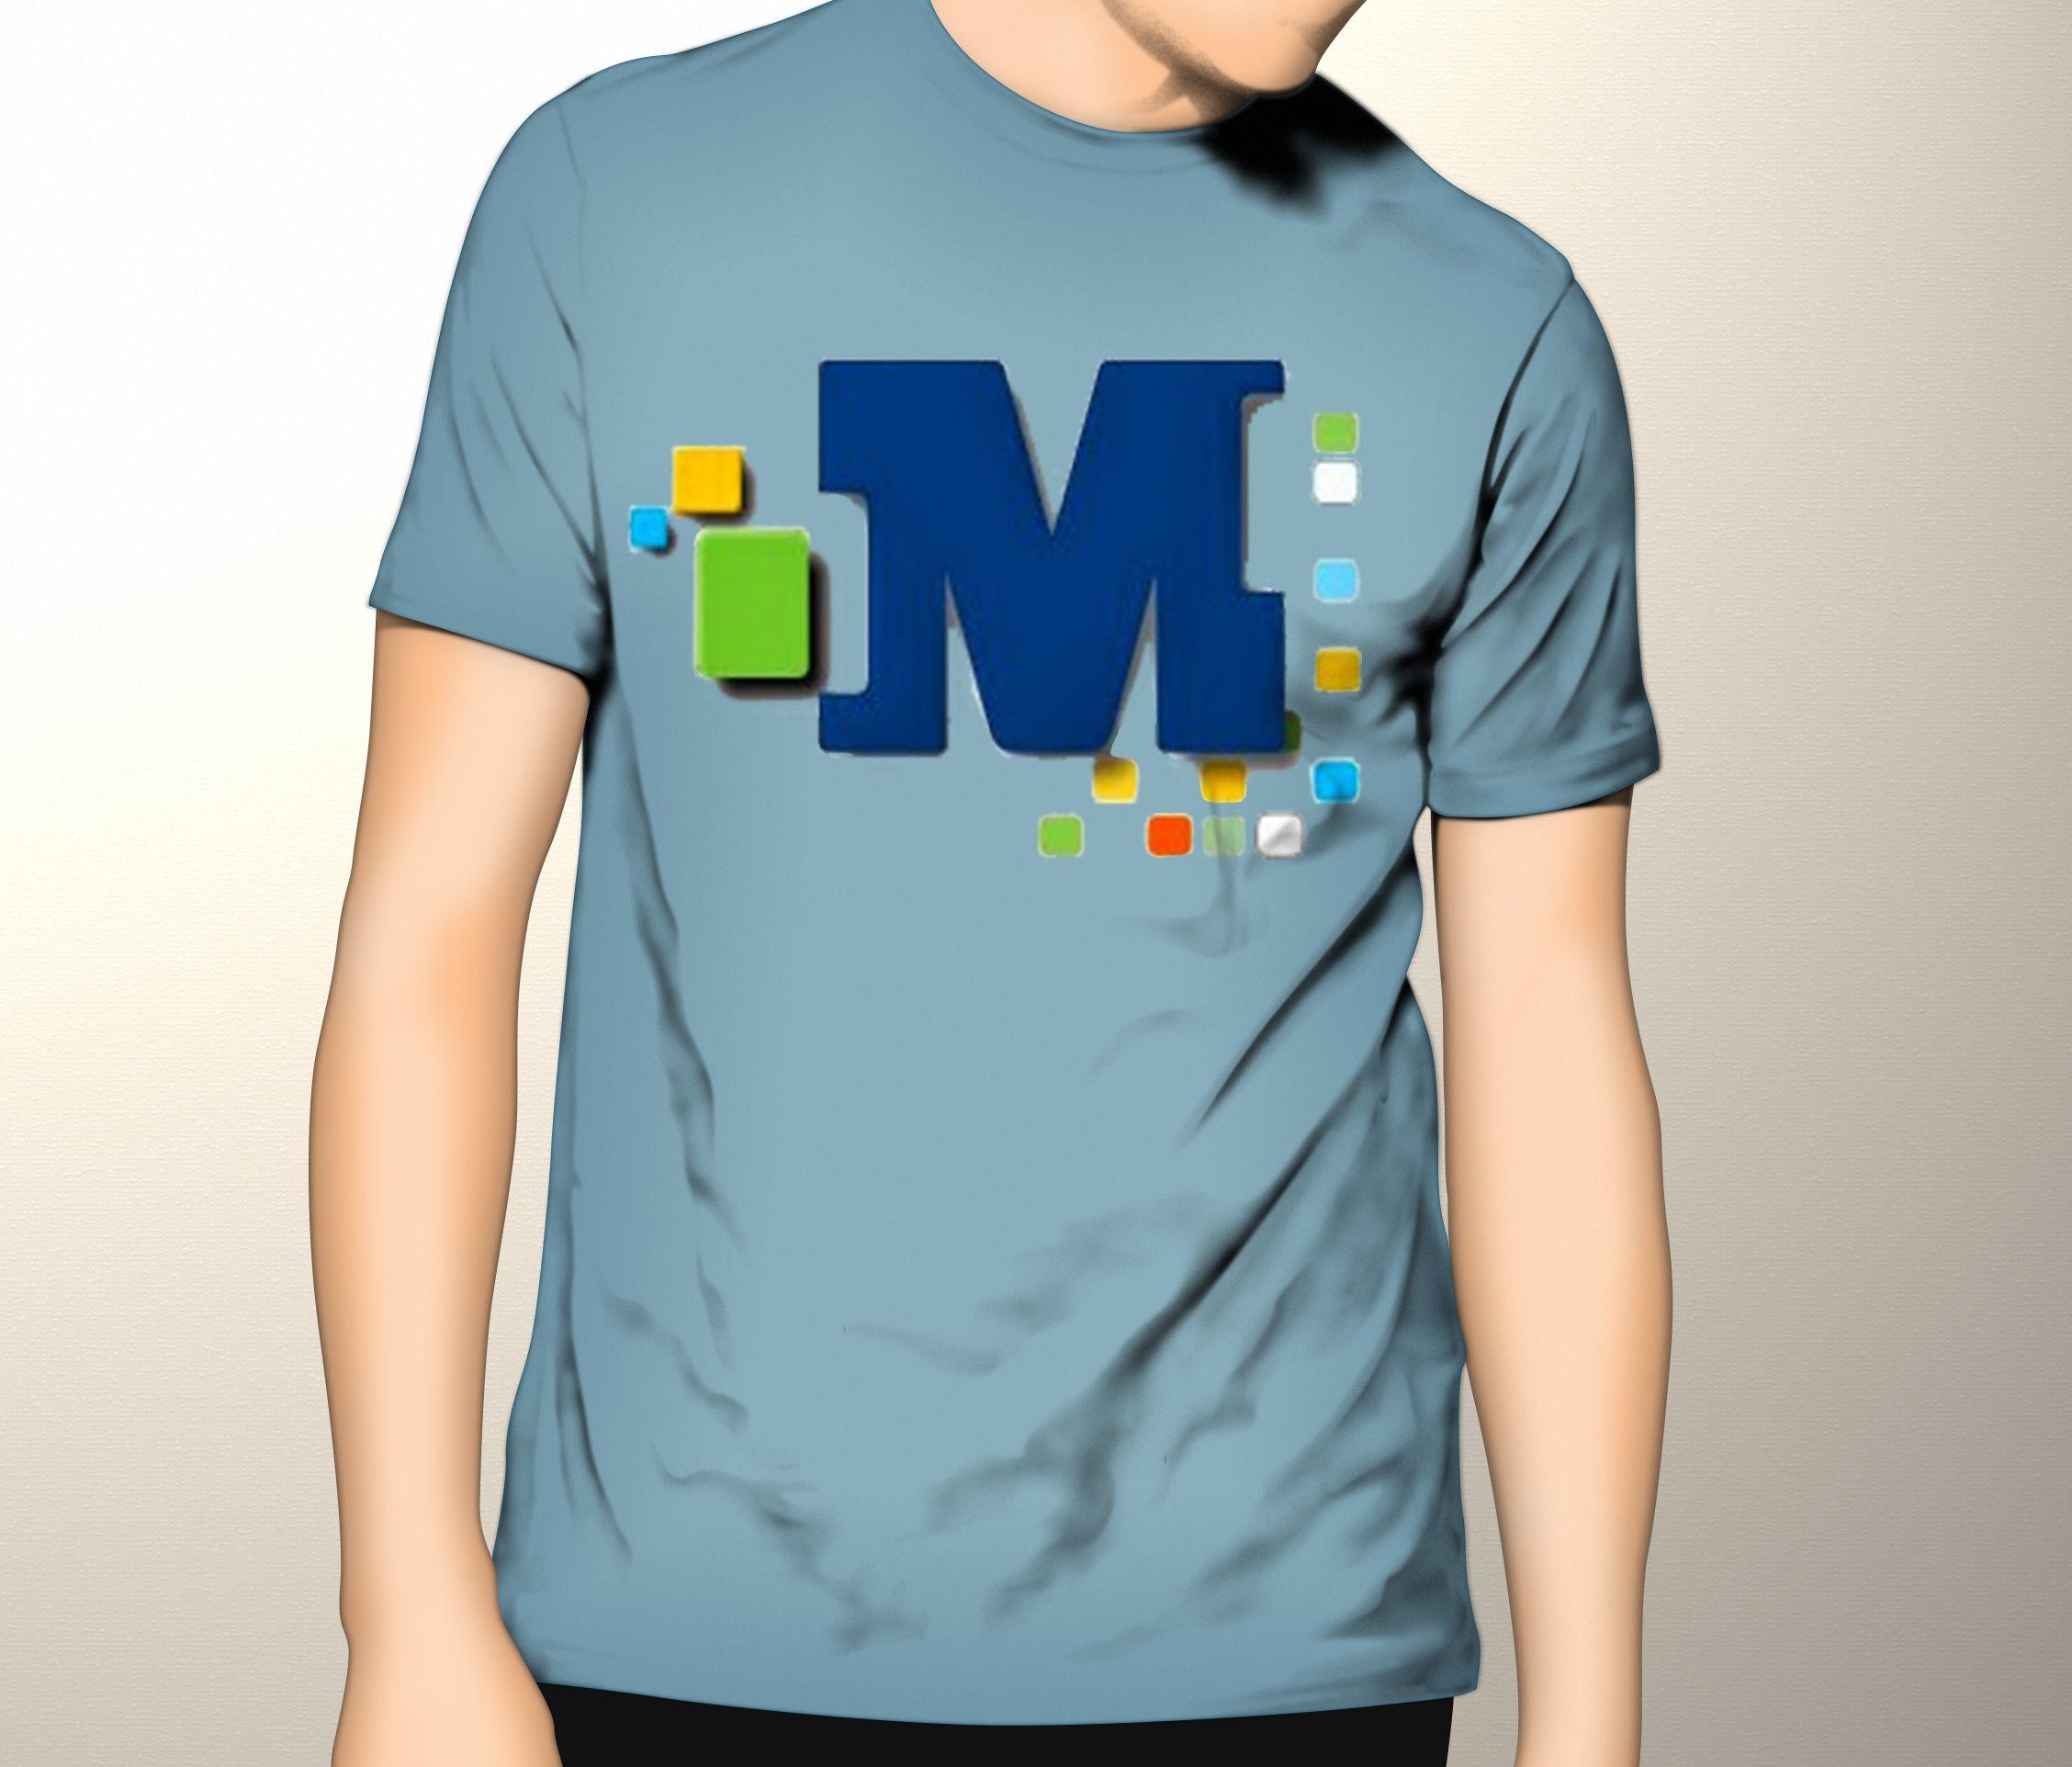 jeffmcc93: make you a custom tshirt mockup for $5, on fiverr.com